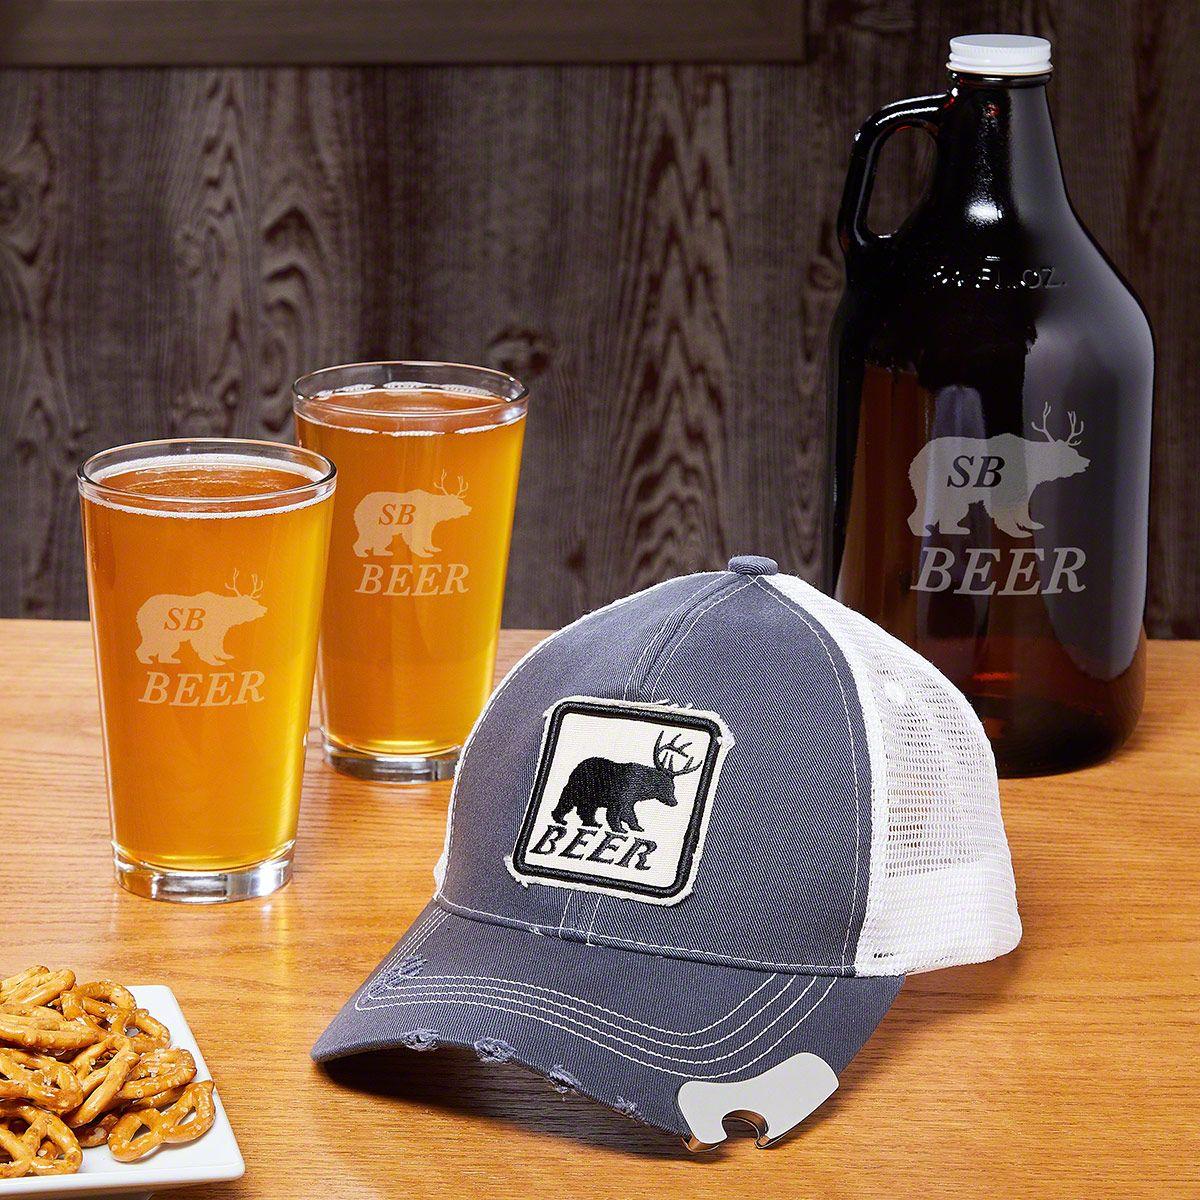 Bear Beer Deer Baseball Cap Bottle Opener & Personalized Glassware